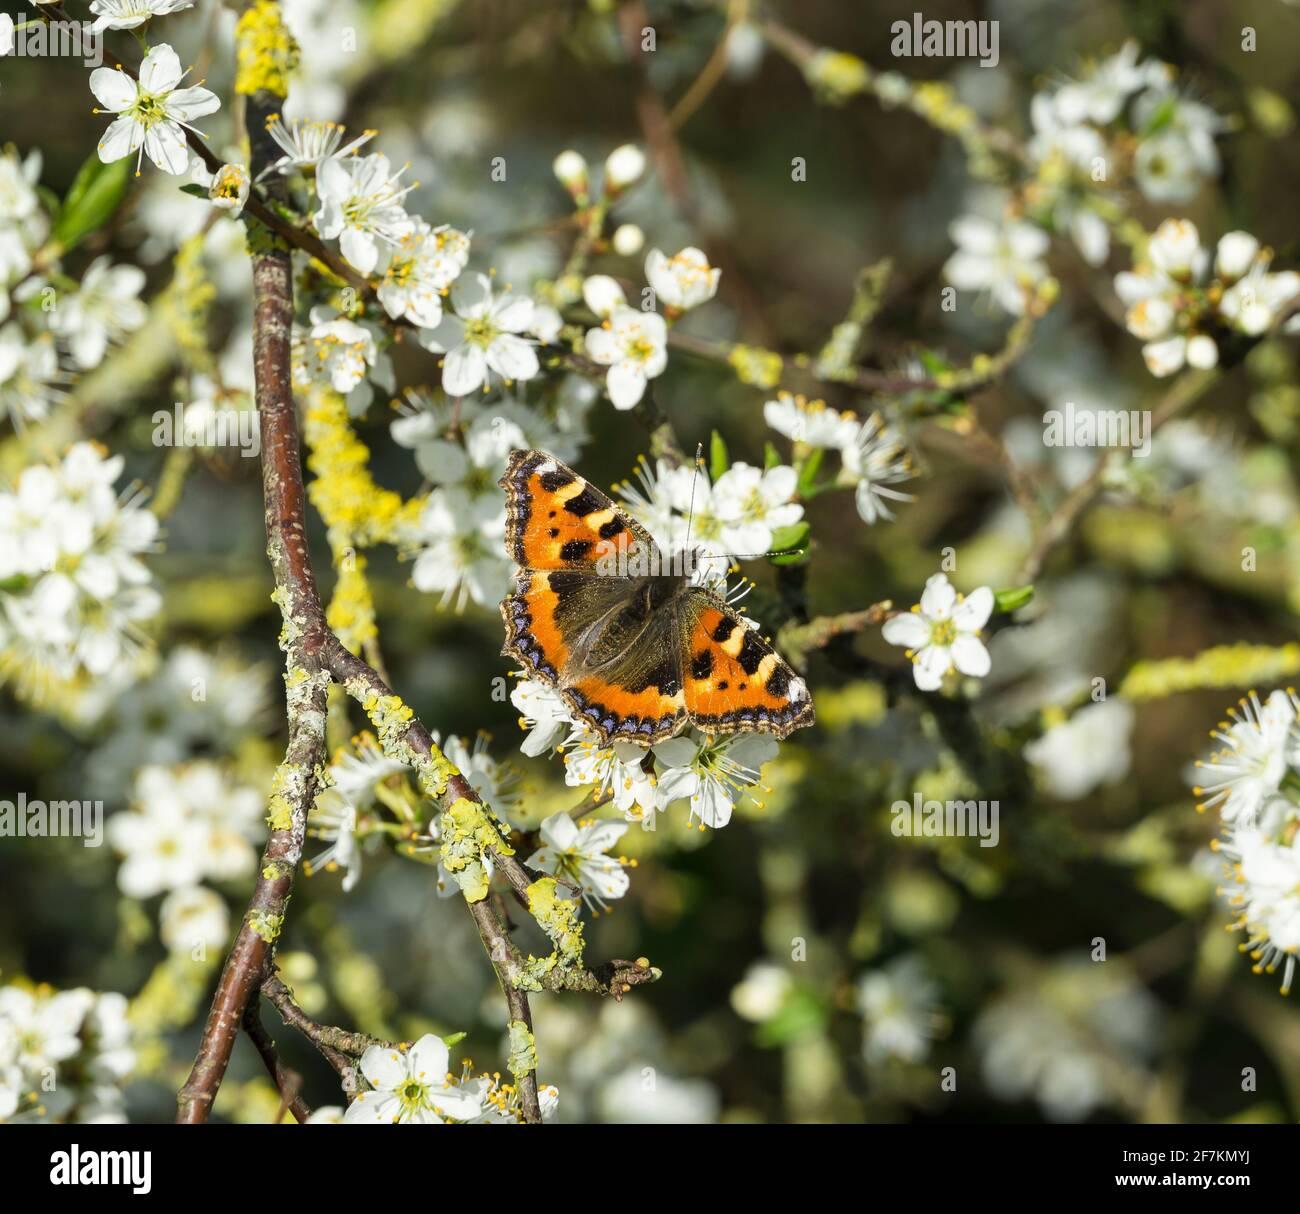 small-tortoiseshell-butterfly-on-may-blossom-2F7KMYJ.jpg